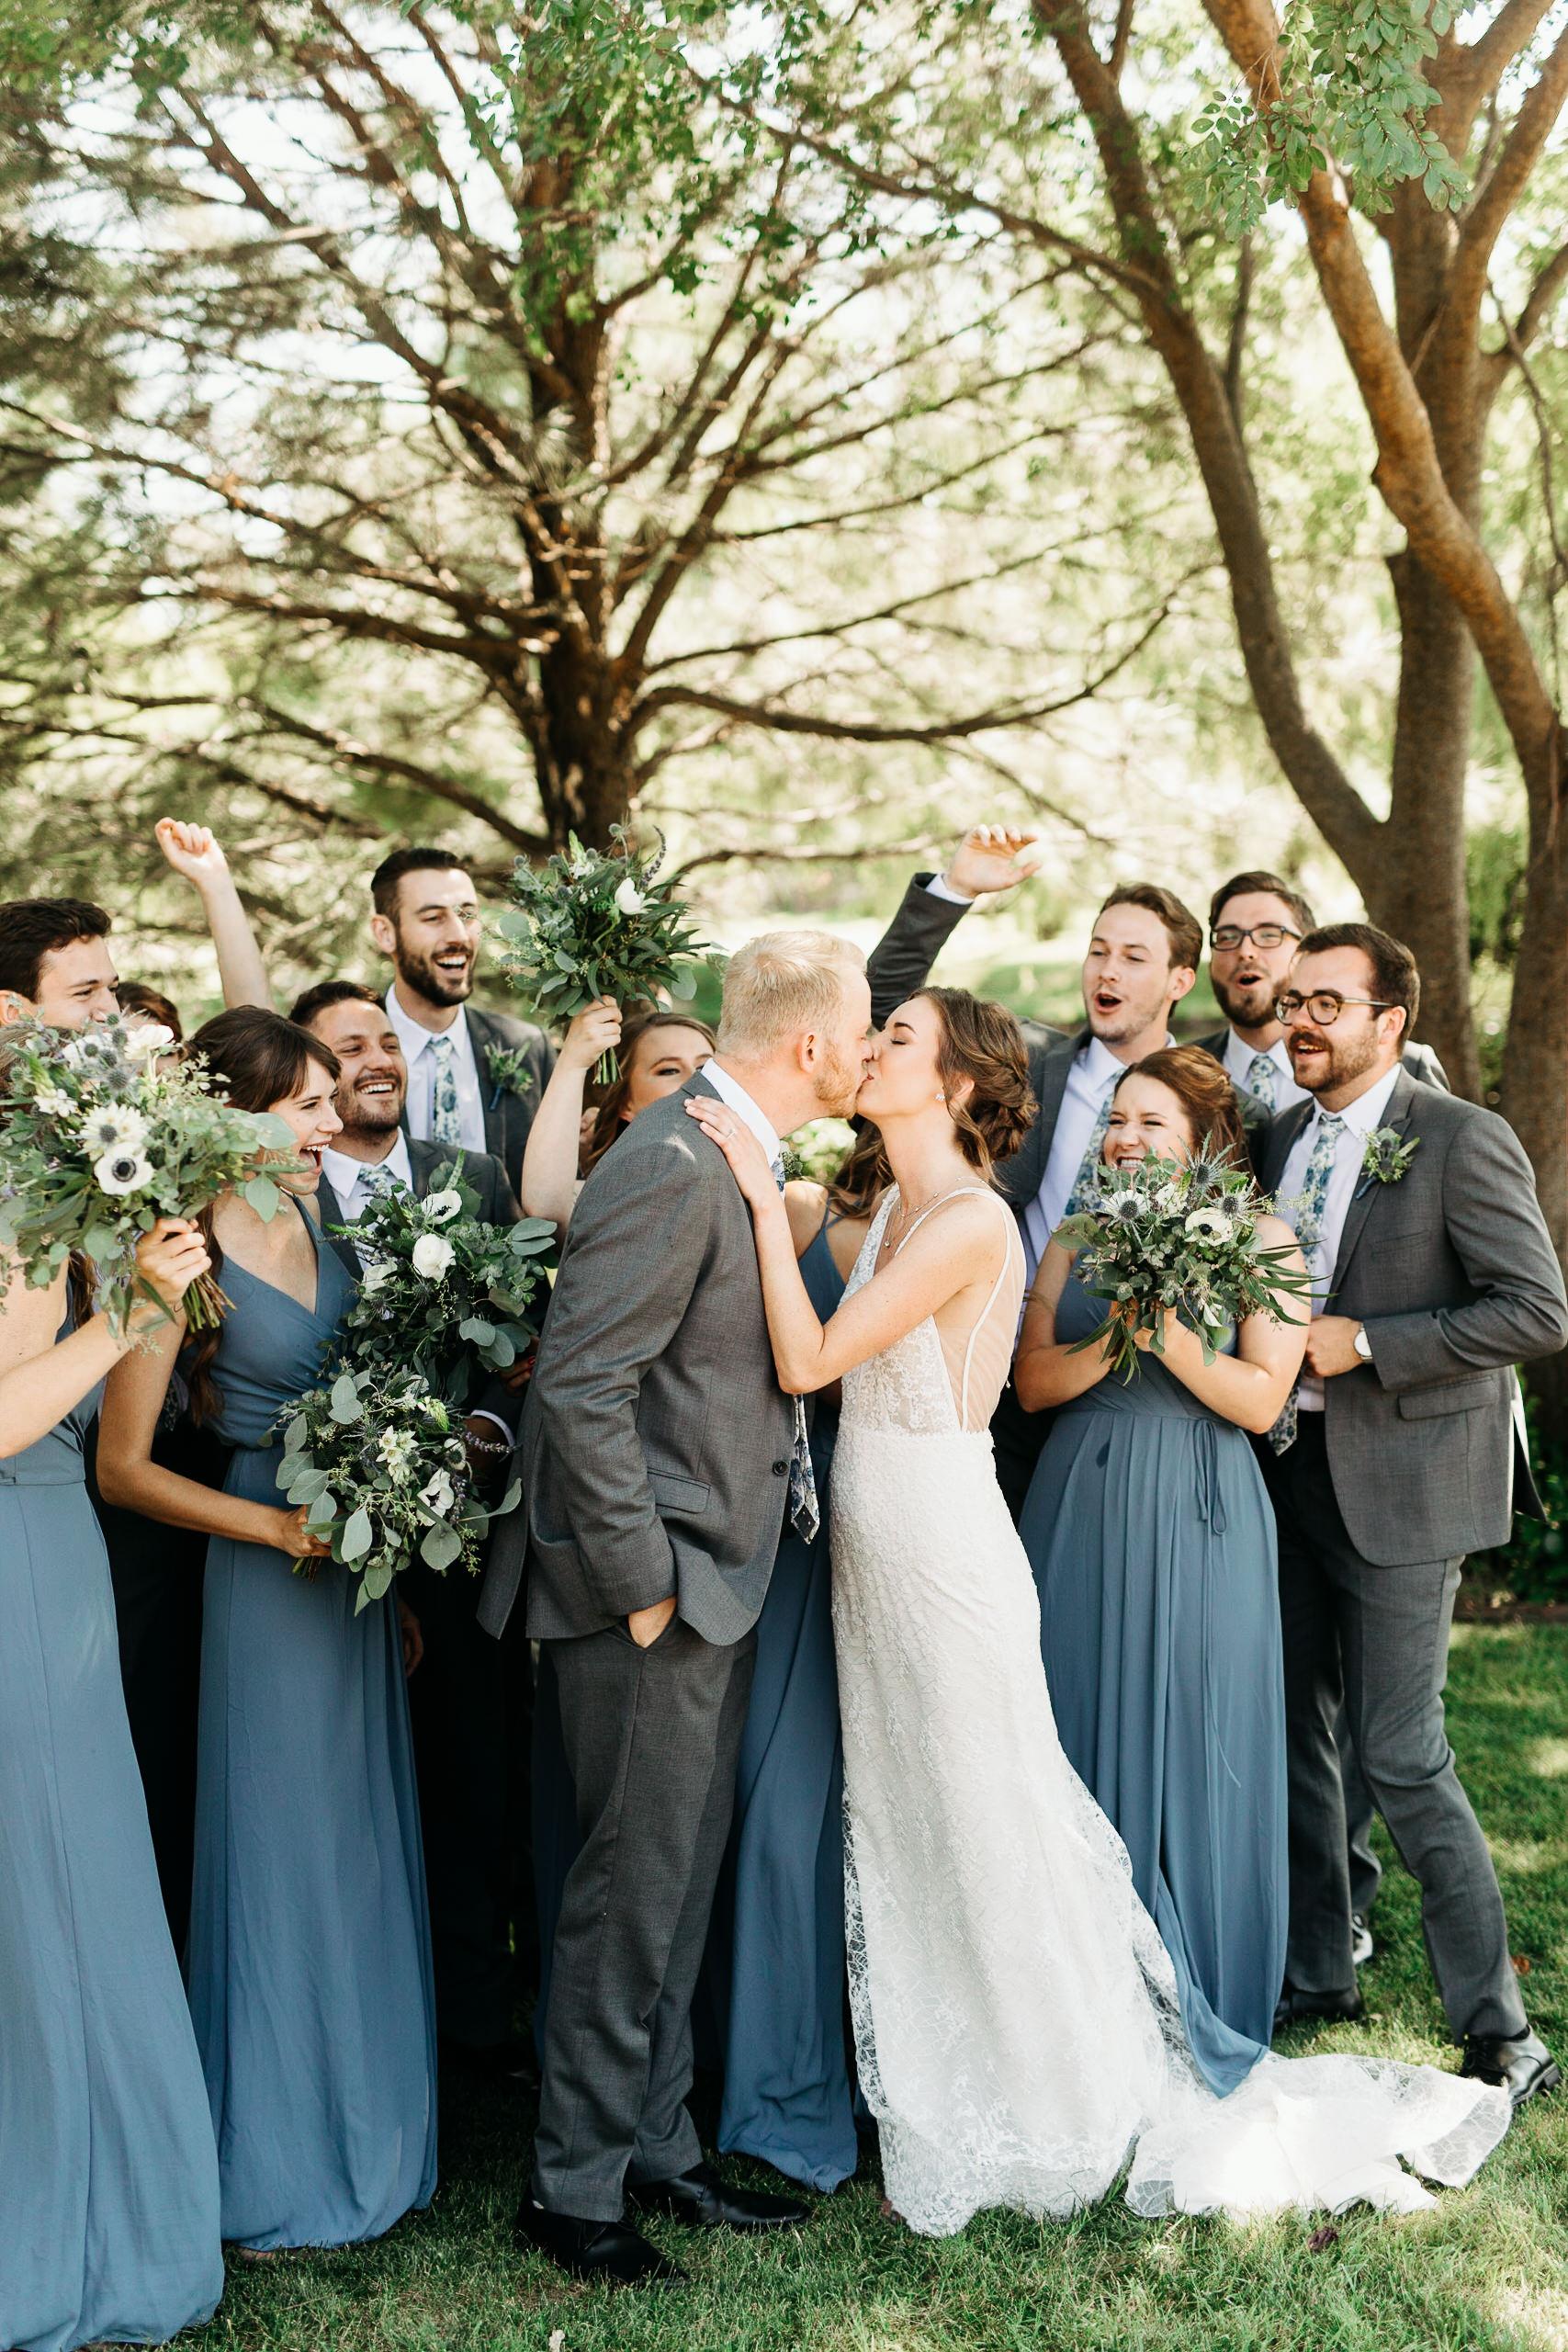 okc-wedding-photographer-coles-garden-wedding-okc-best-wedding-photographers-53.jpg